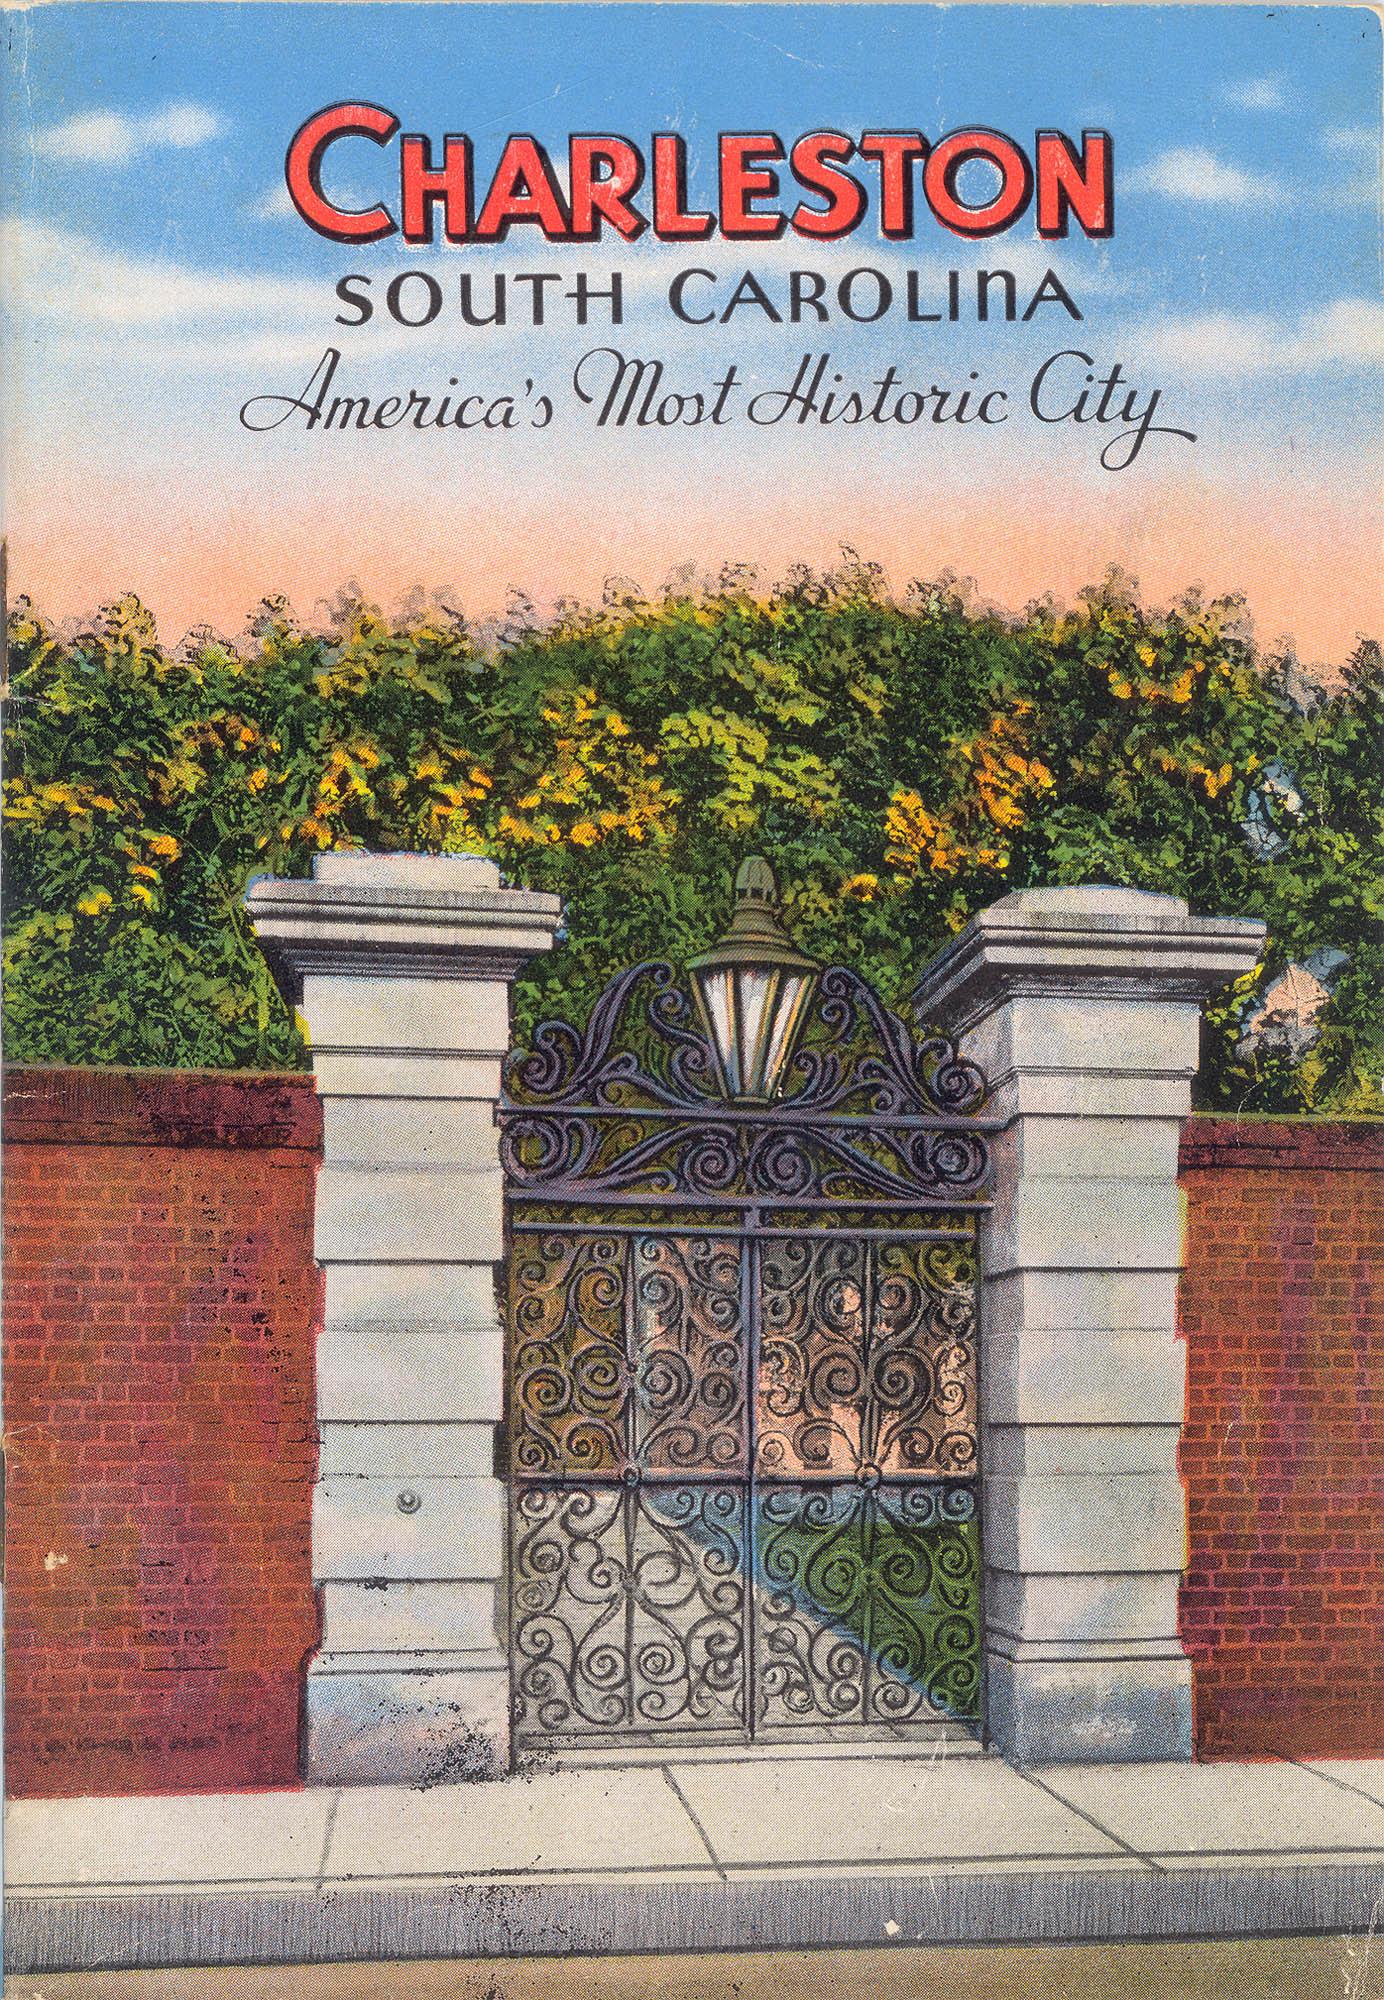 Charleston, South Carolina:  America's Most Historic City